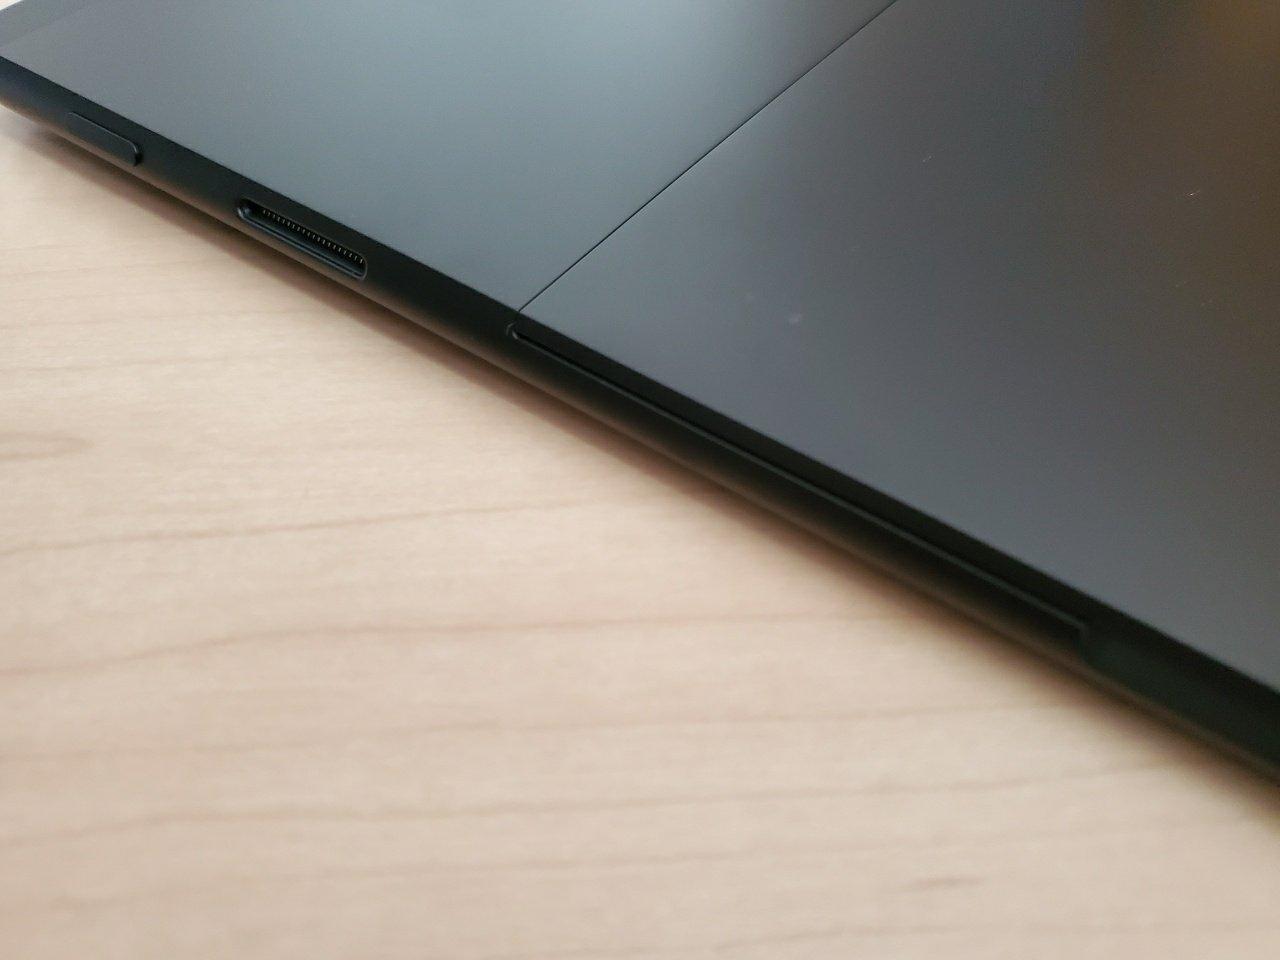 SurfaceProX_電源ボタン